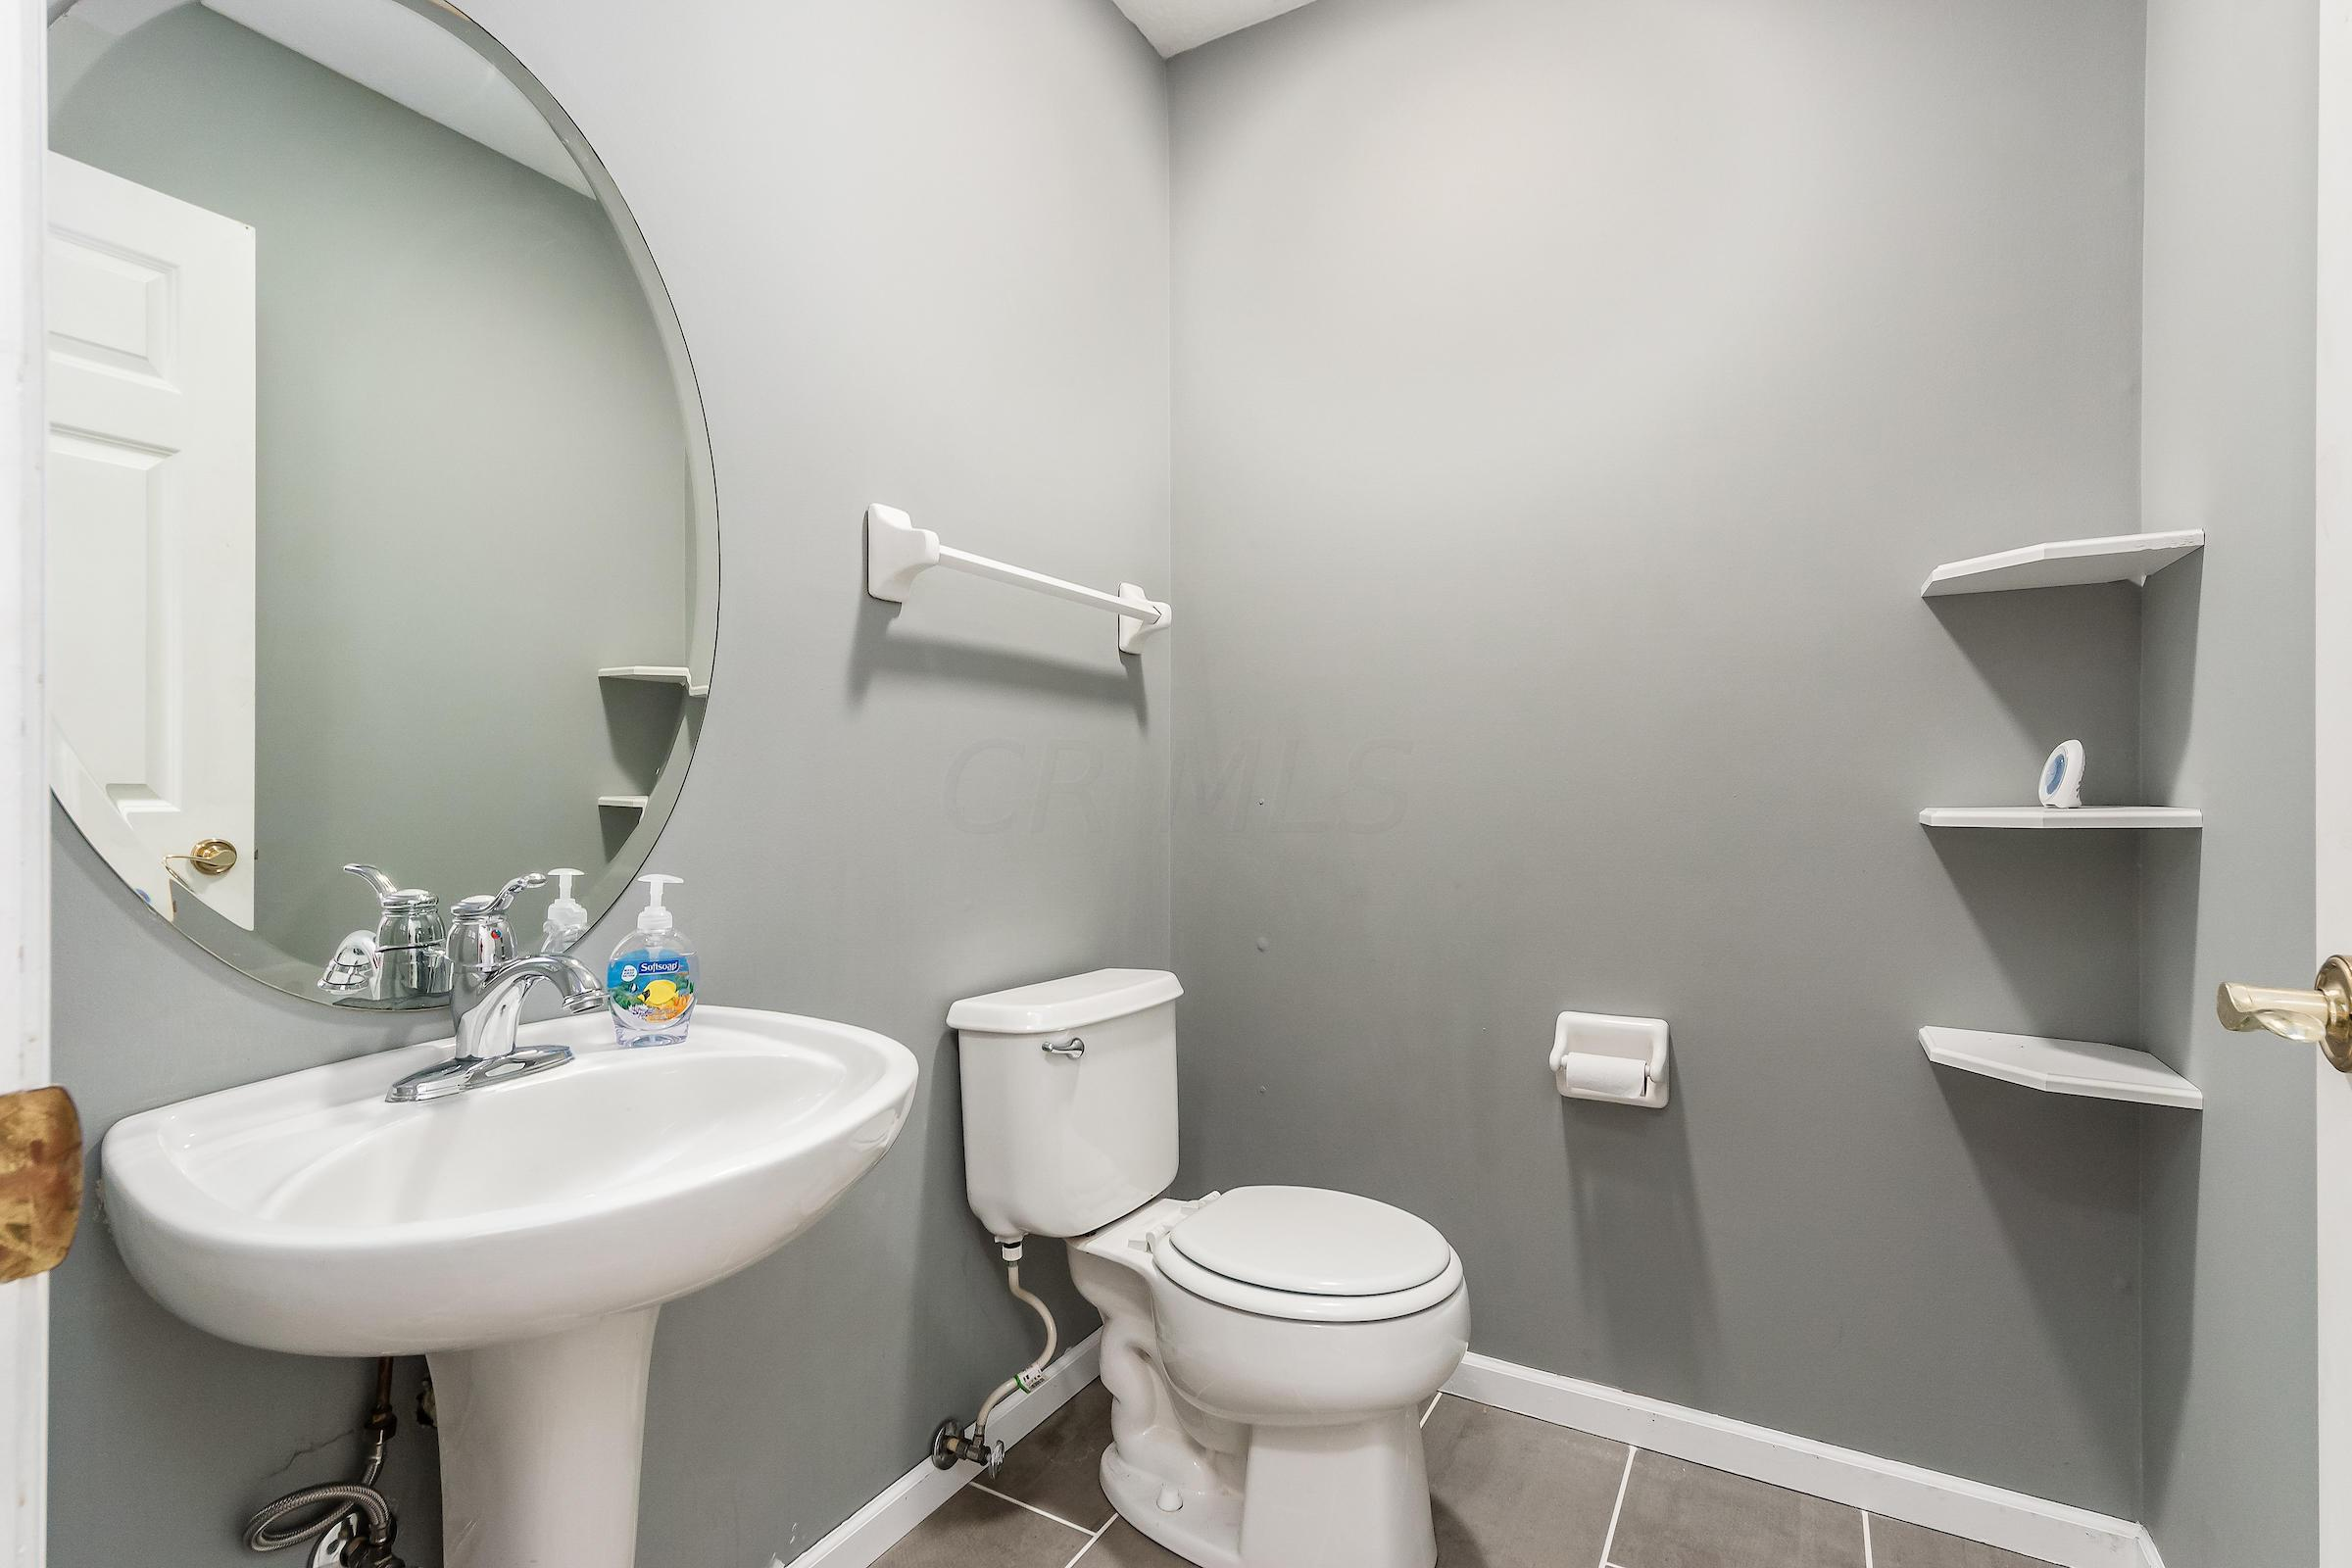 6971 Old Bridge Lane, Dublin, Ohio 43016, 2 Bedrooms Bedrooms, ,2 BathroomsBathrooms,Residential,For Sale,Old Bridge,220024391